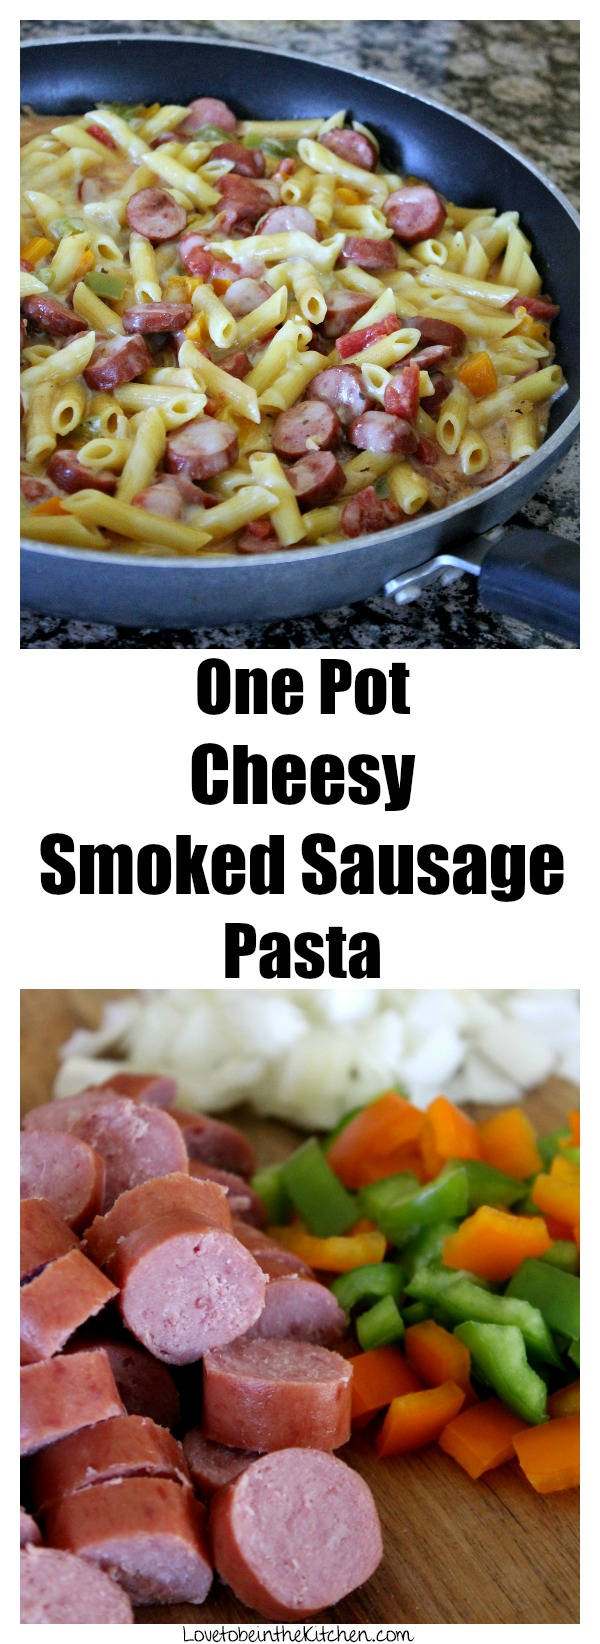 One Pot Cheesy Smoked Sausage Pasta